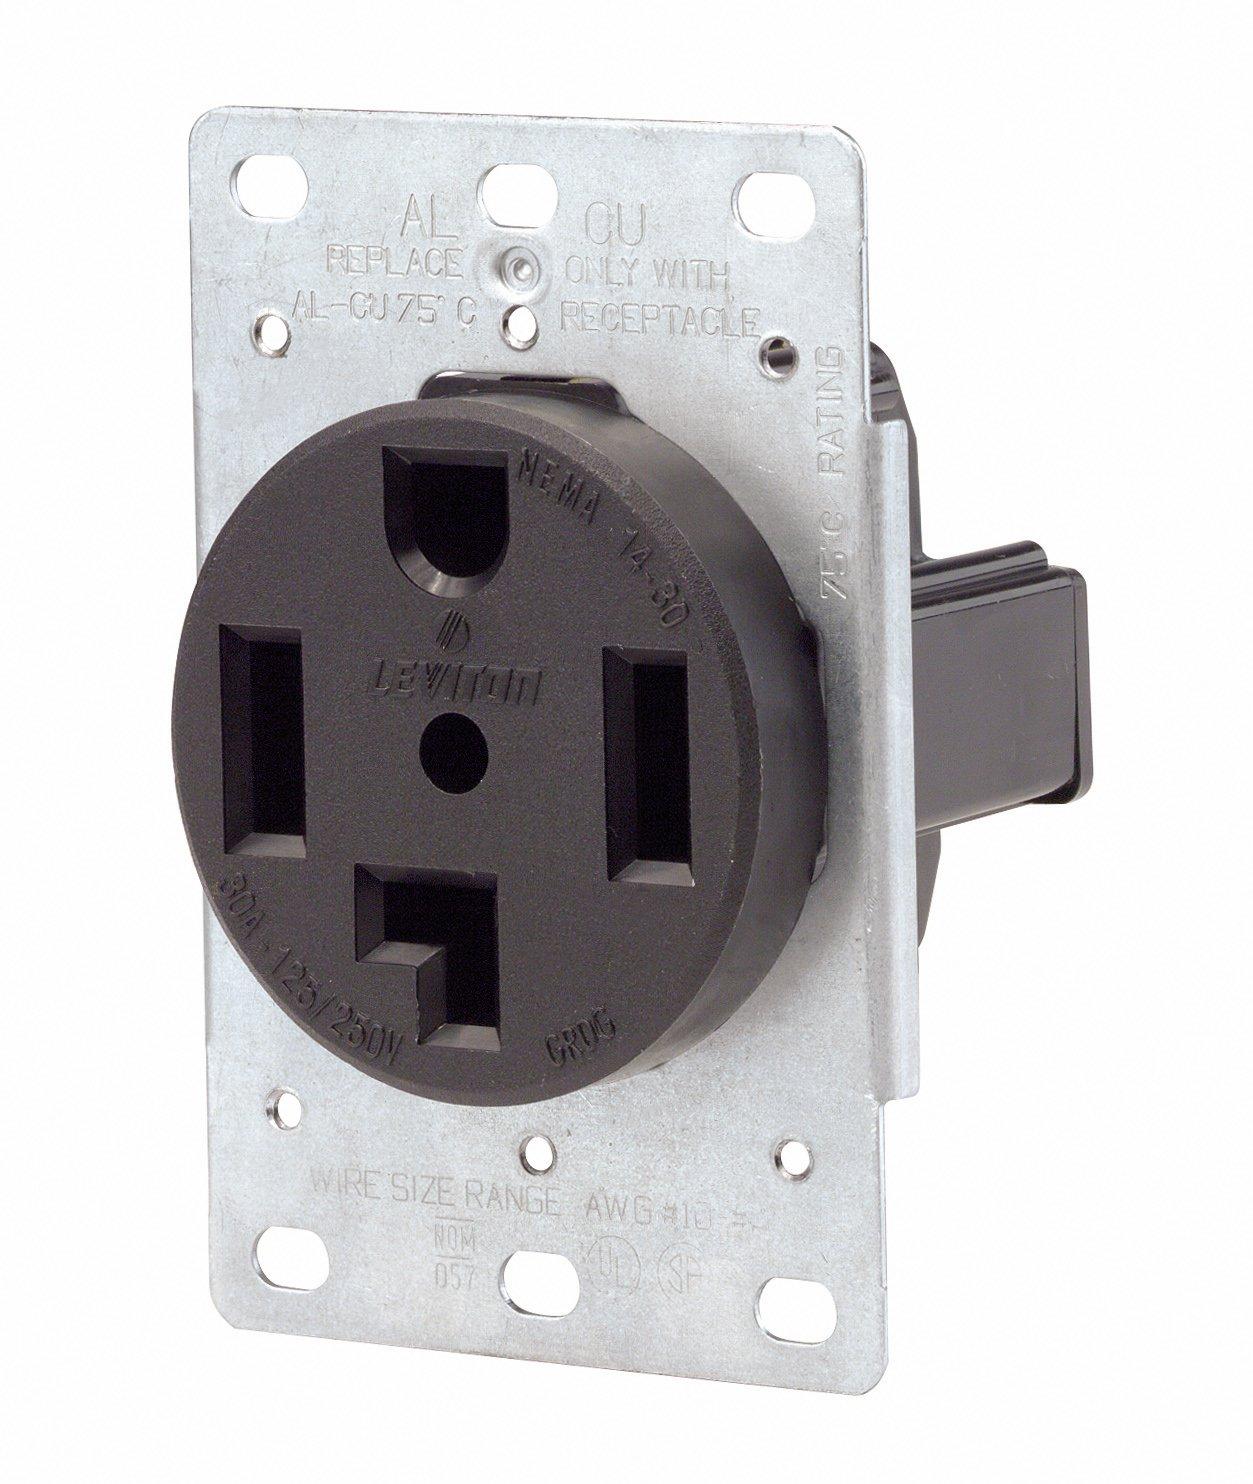 Receptacle Wiring 220 Volt 4 Wire: Leviton 071-00278-000 4 Wire 30 Amp 250 Volt Flush Mount